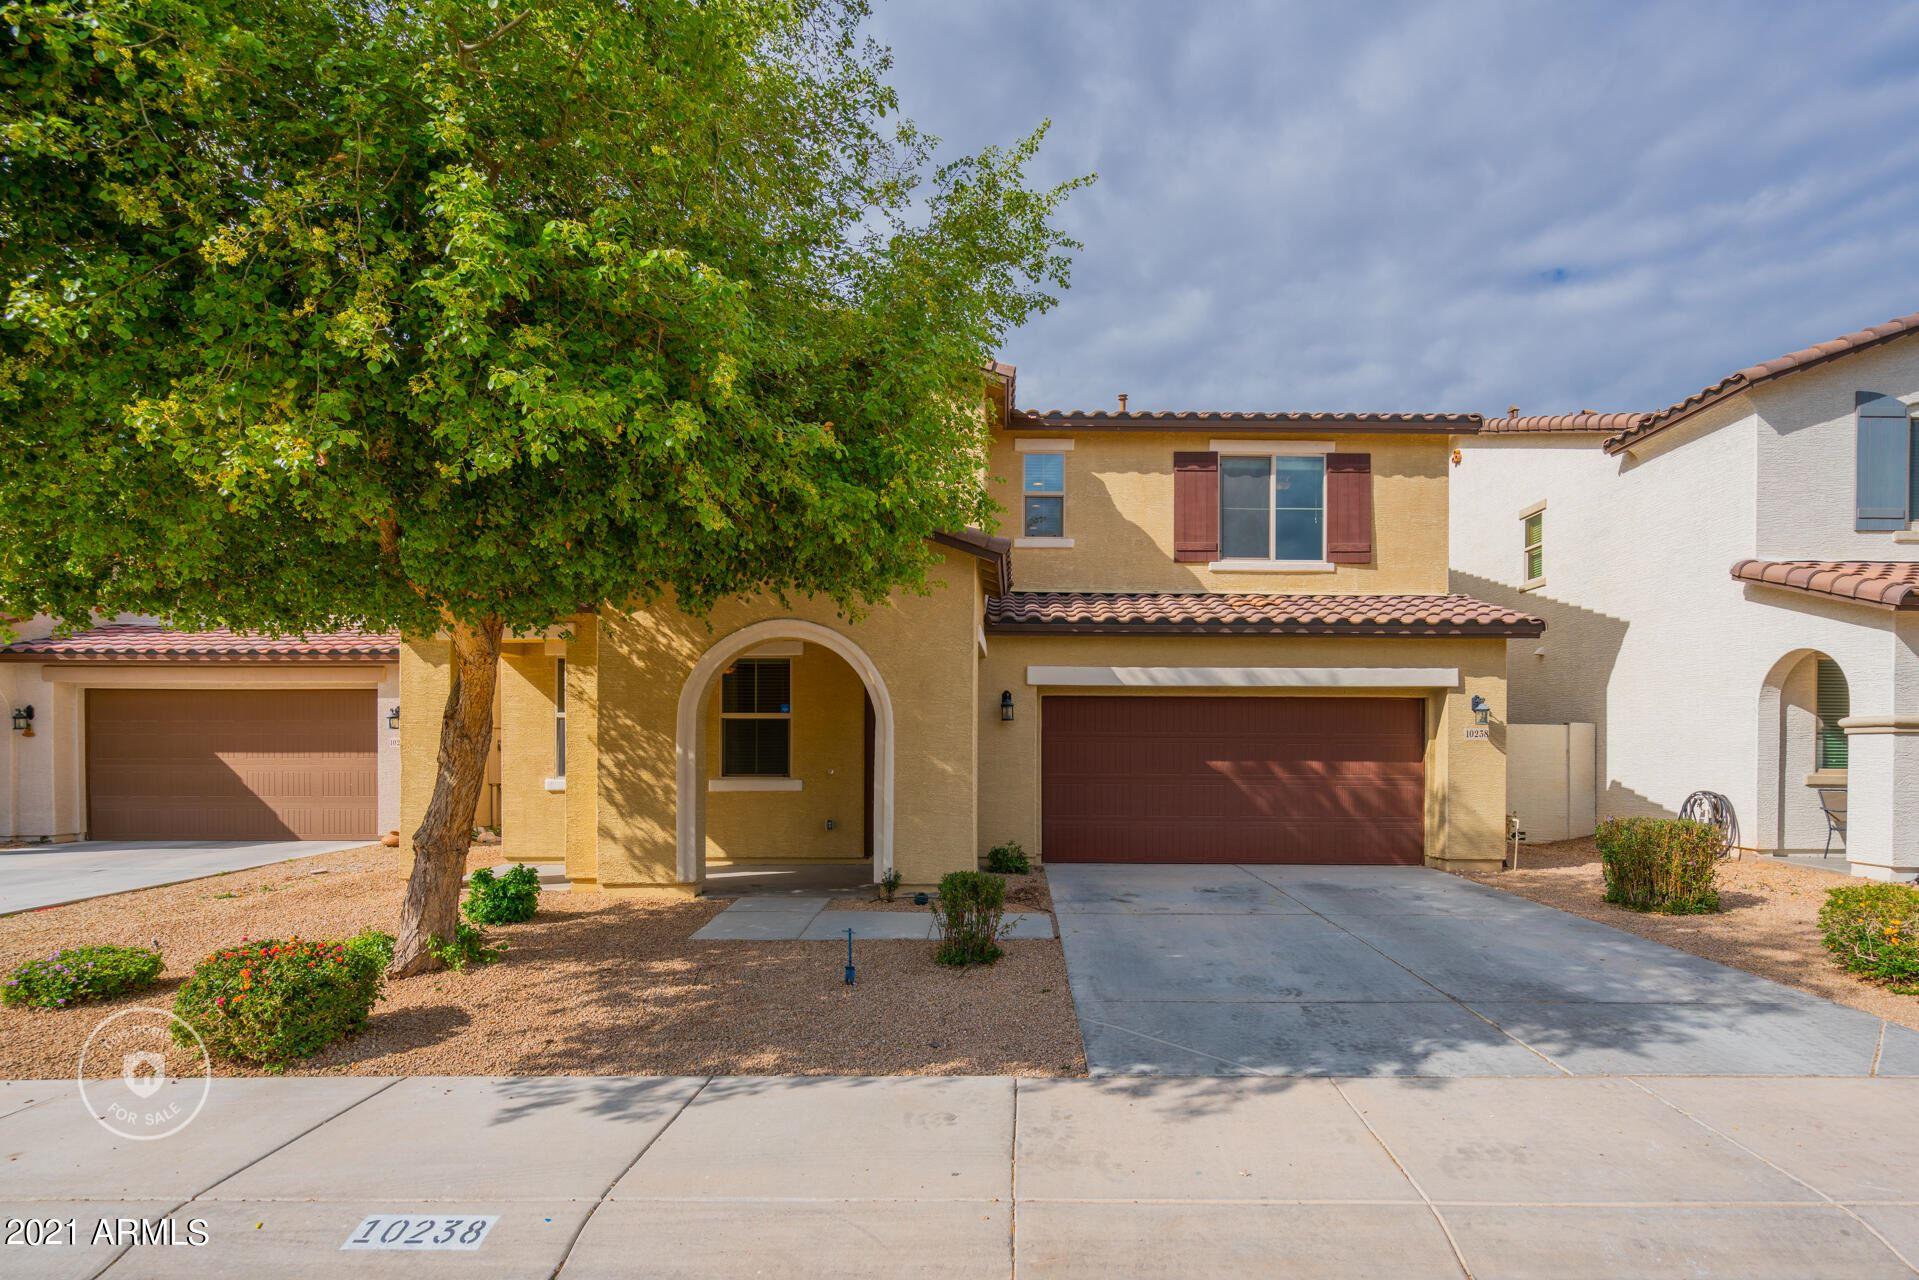 10238 W LEVI Drive, Tolleson, AZ 85353 - MLS#: 6213299